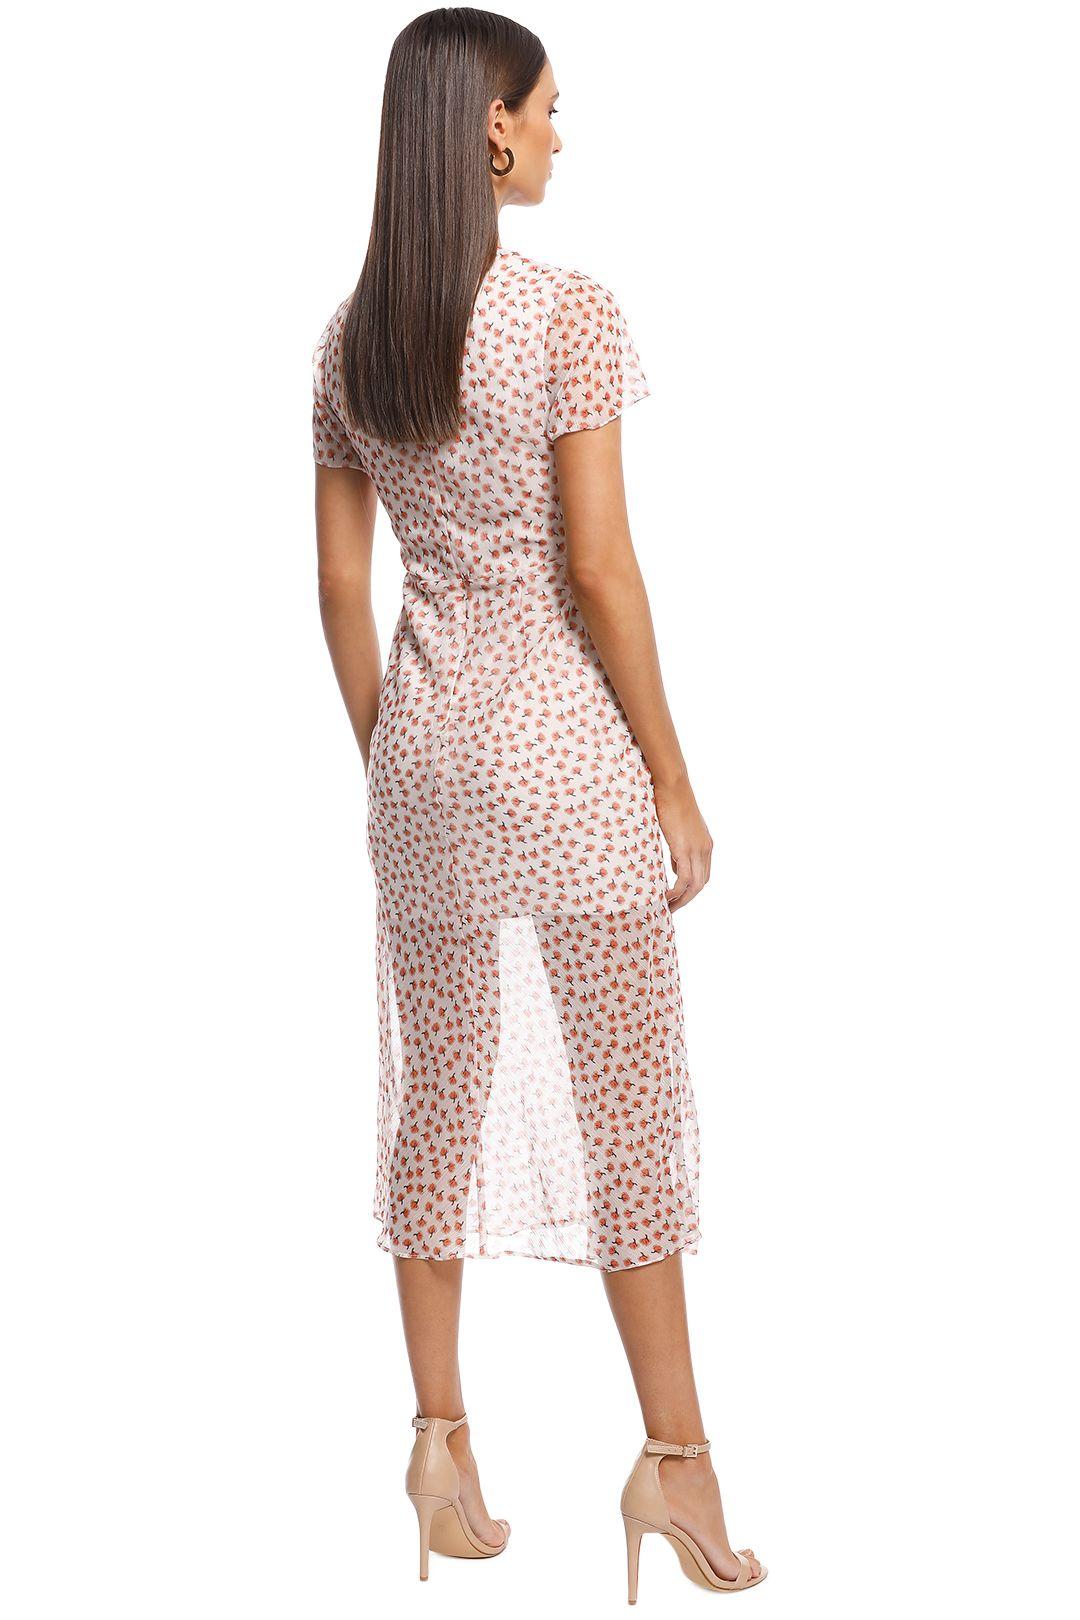 The East Order - Fin Midi Dress - Print - Back